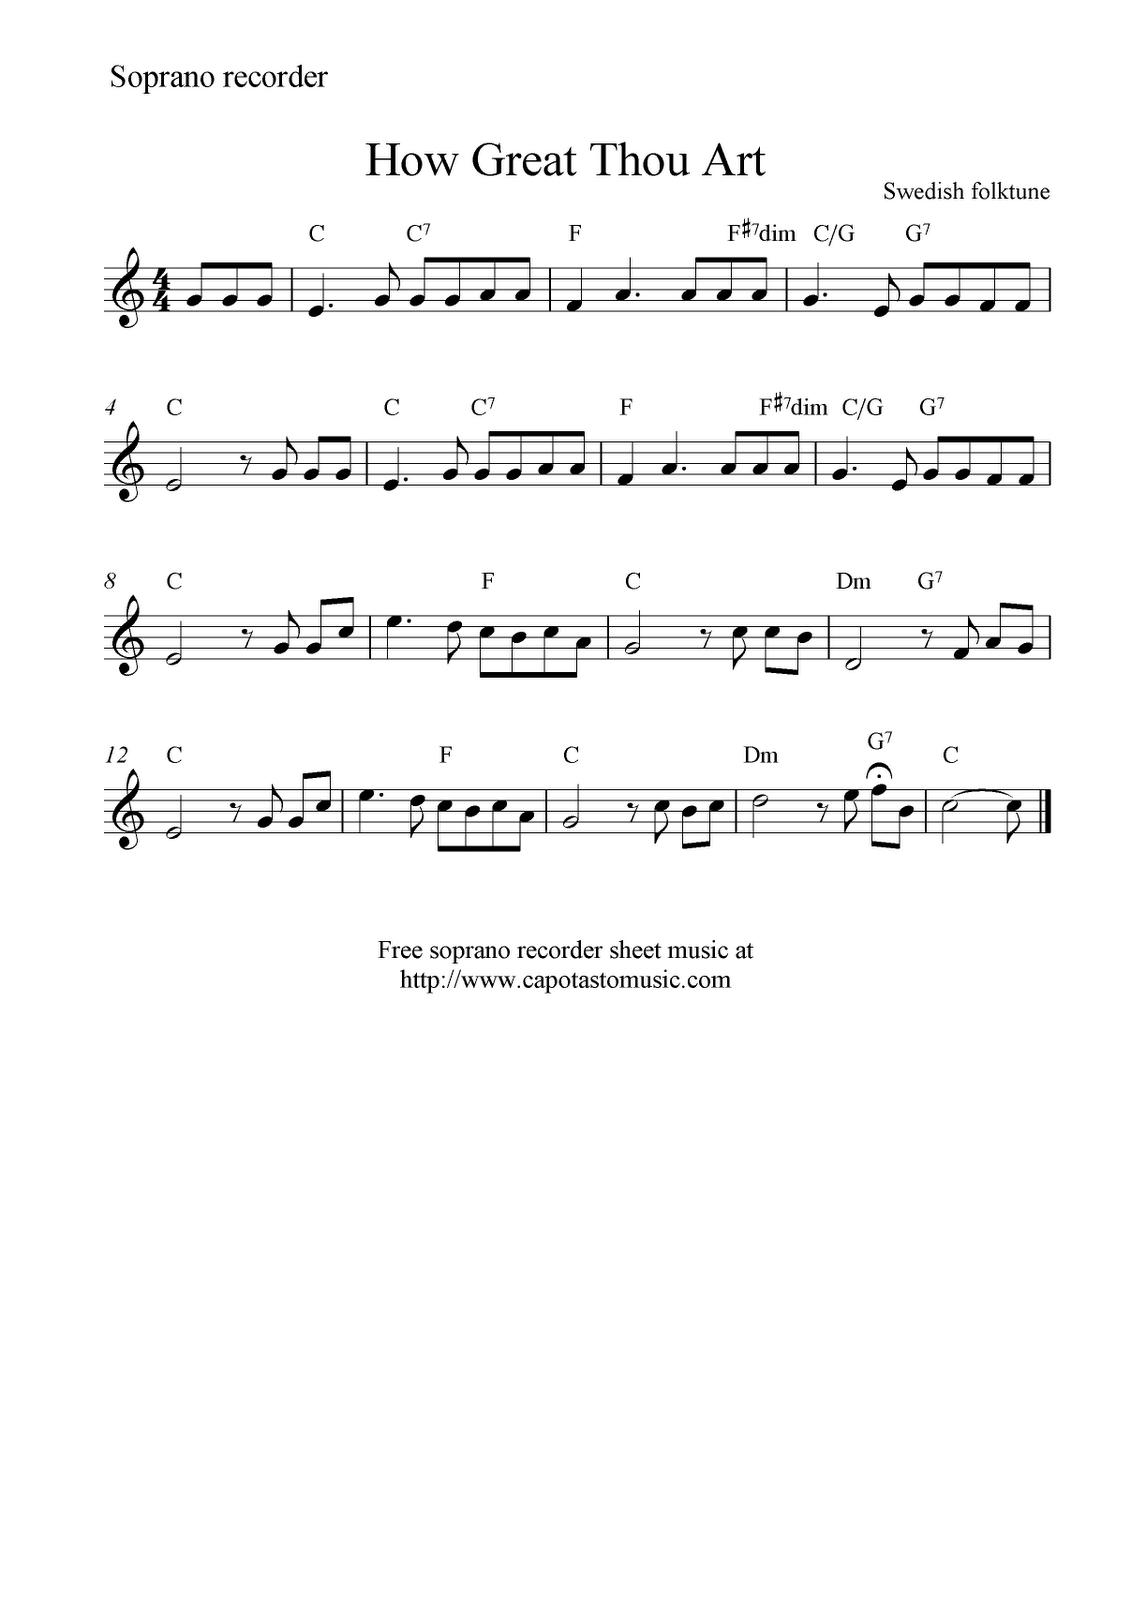 How Great Thou Art Free Soprano Recorder Sheet Music